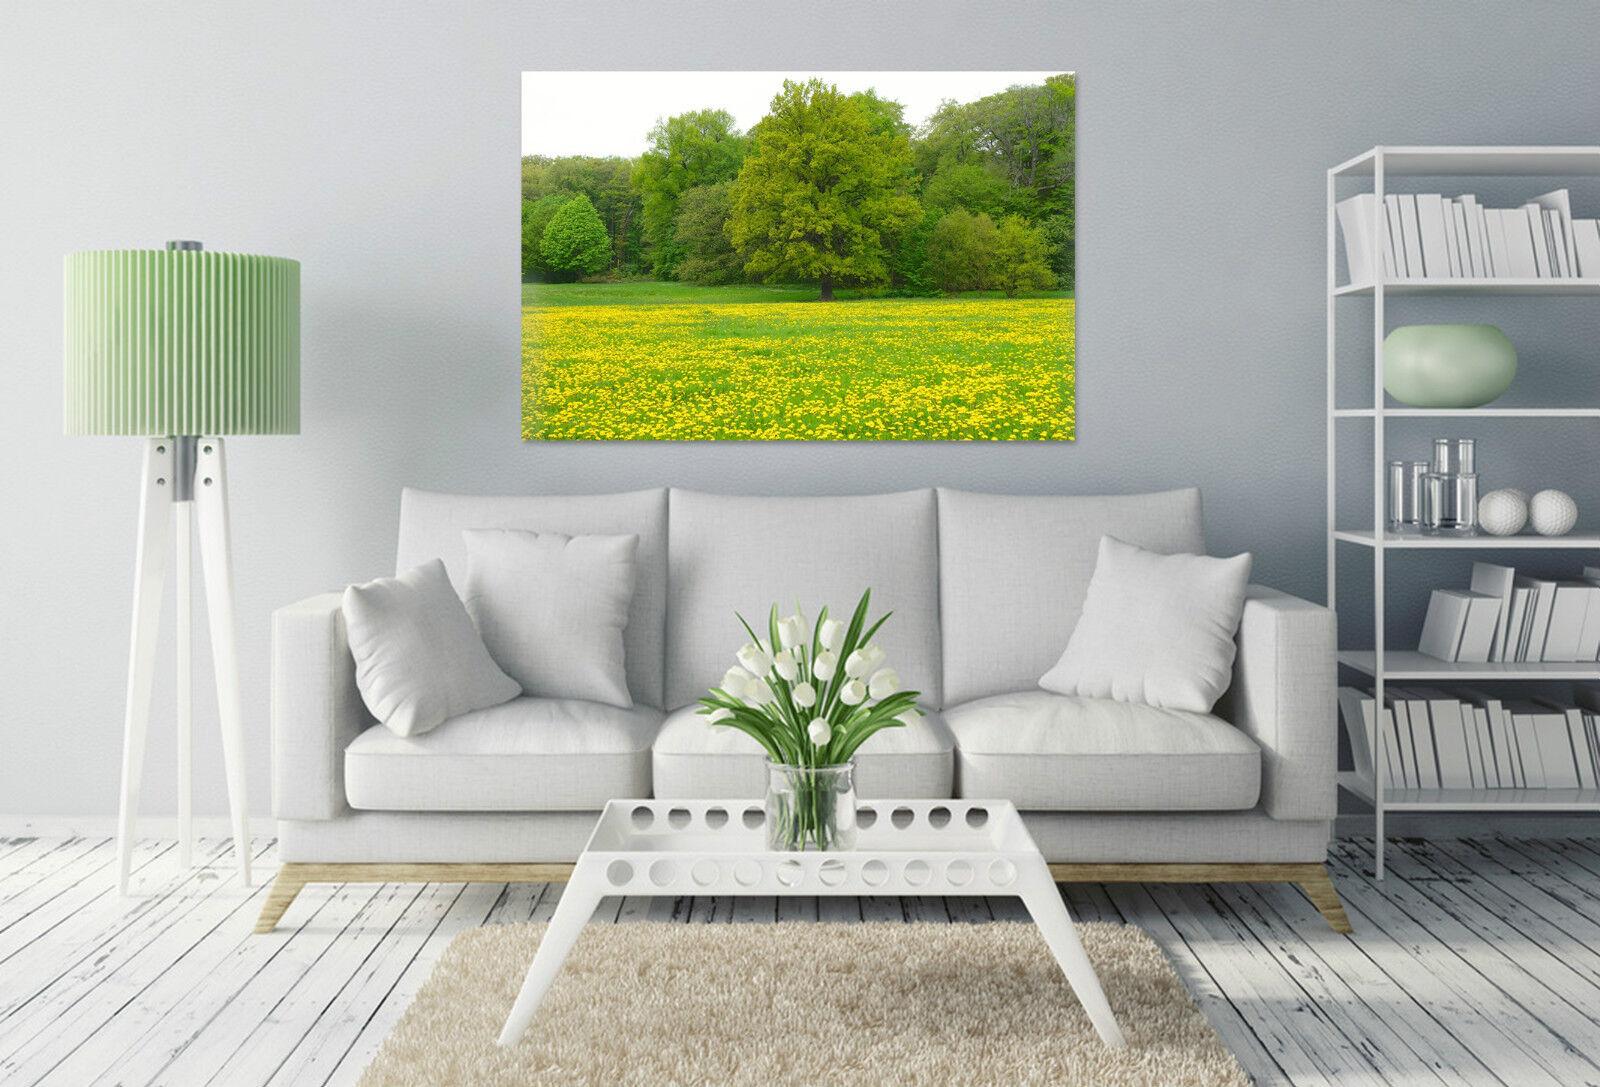 3D Grne Bume, Laub 366 Fototapeten Wandbild BildTapete Familie AJSTORE DE